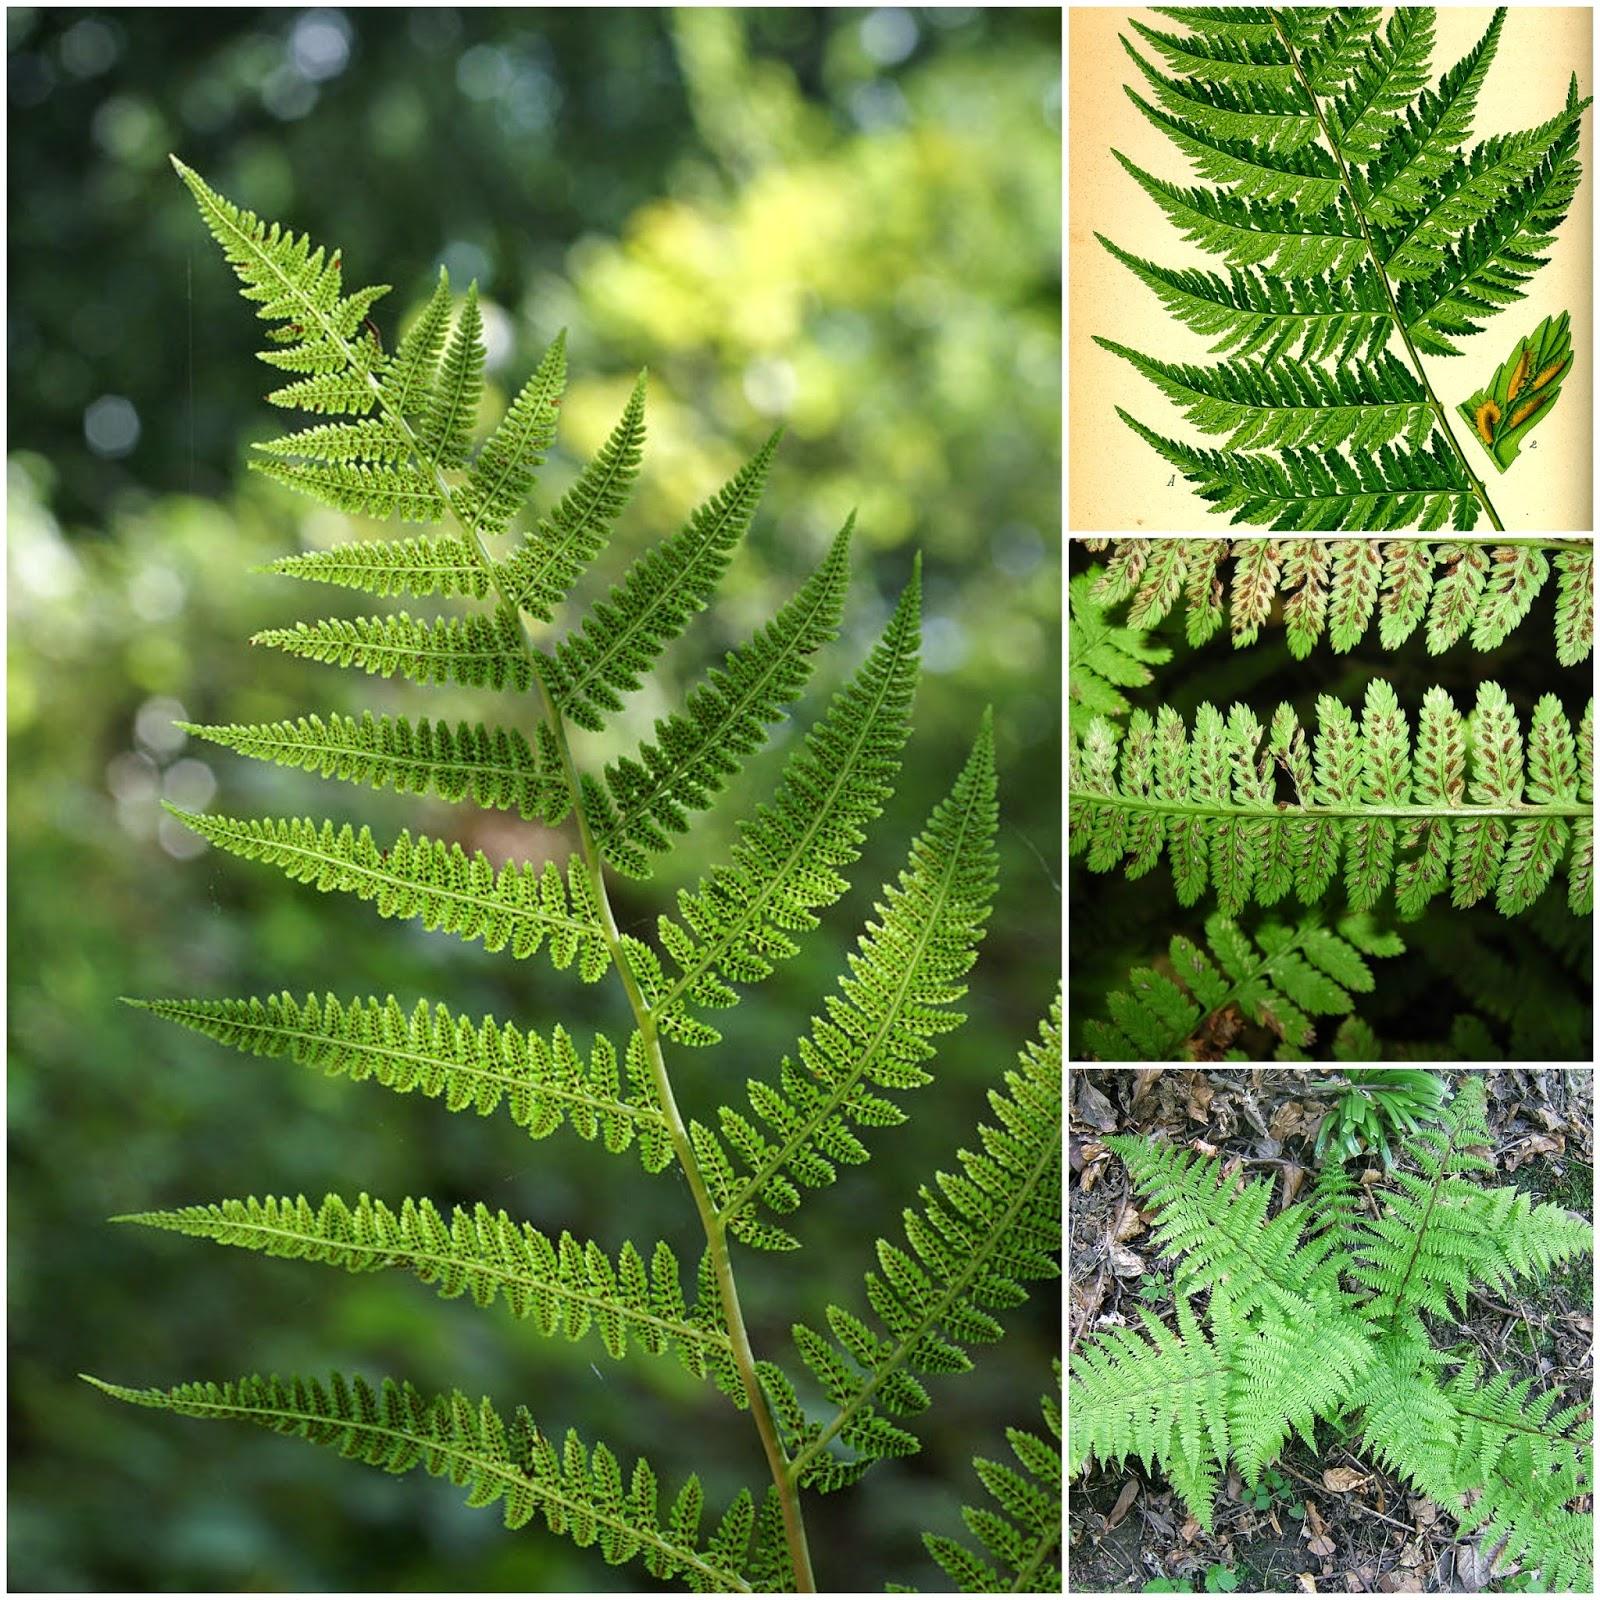 Misterios con Xana: Misterios del mundo vegetal: Helecho